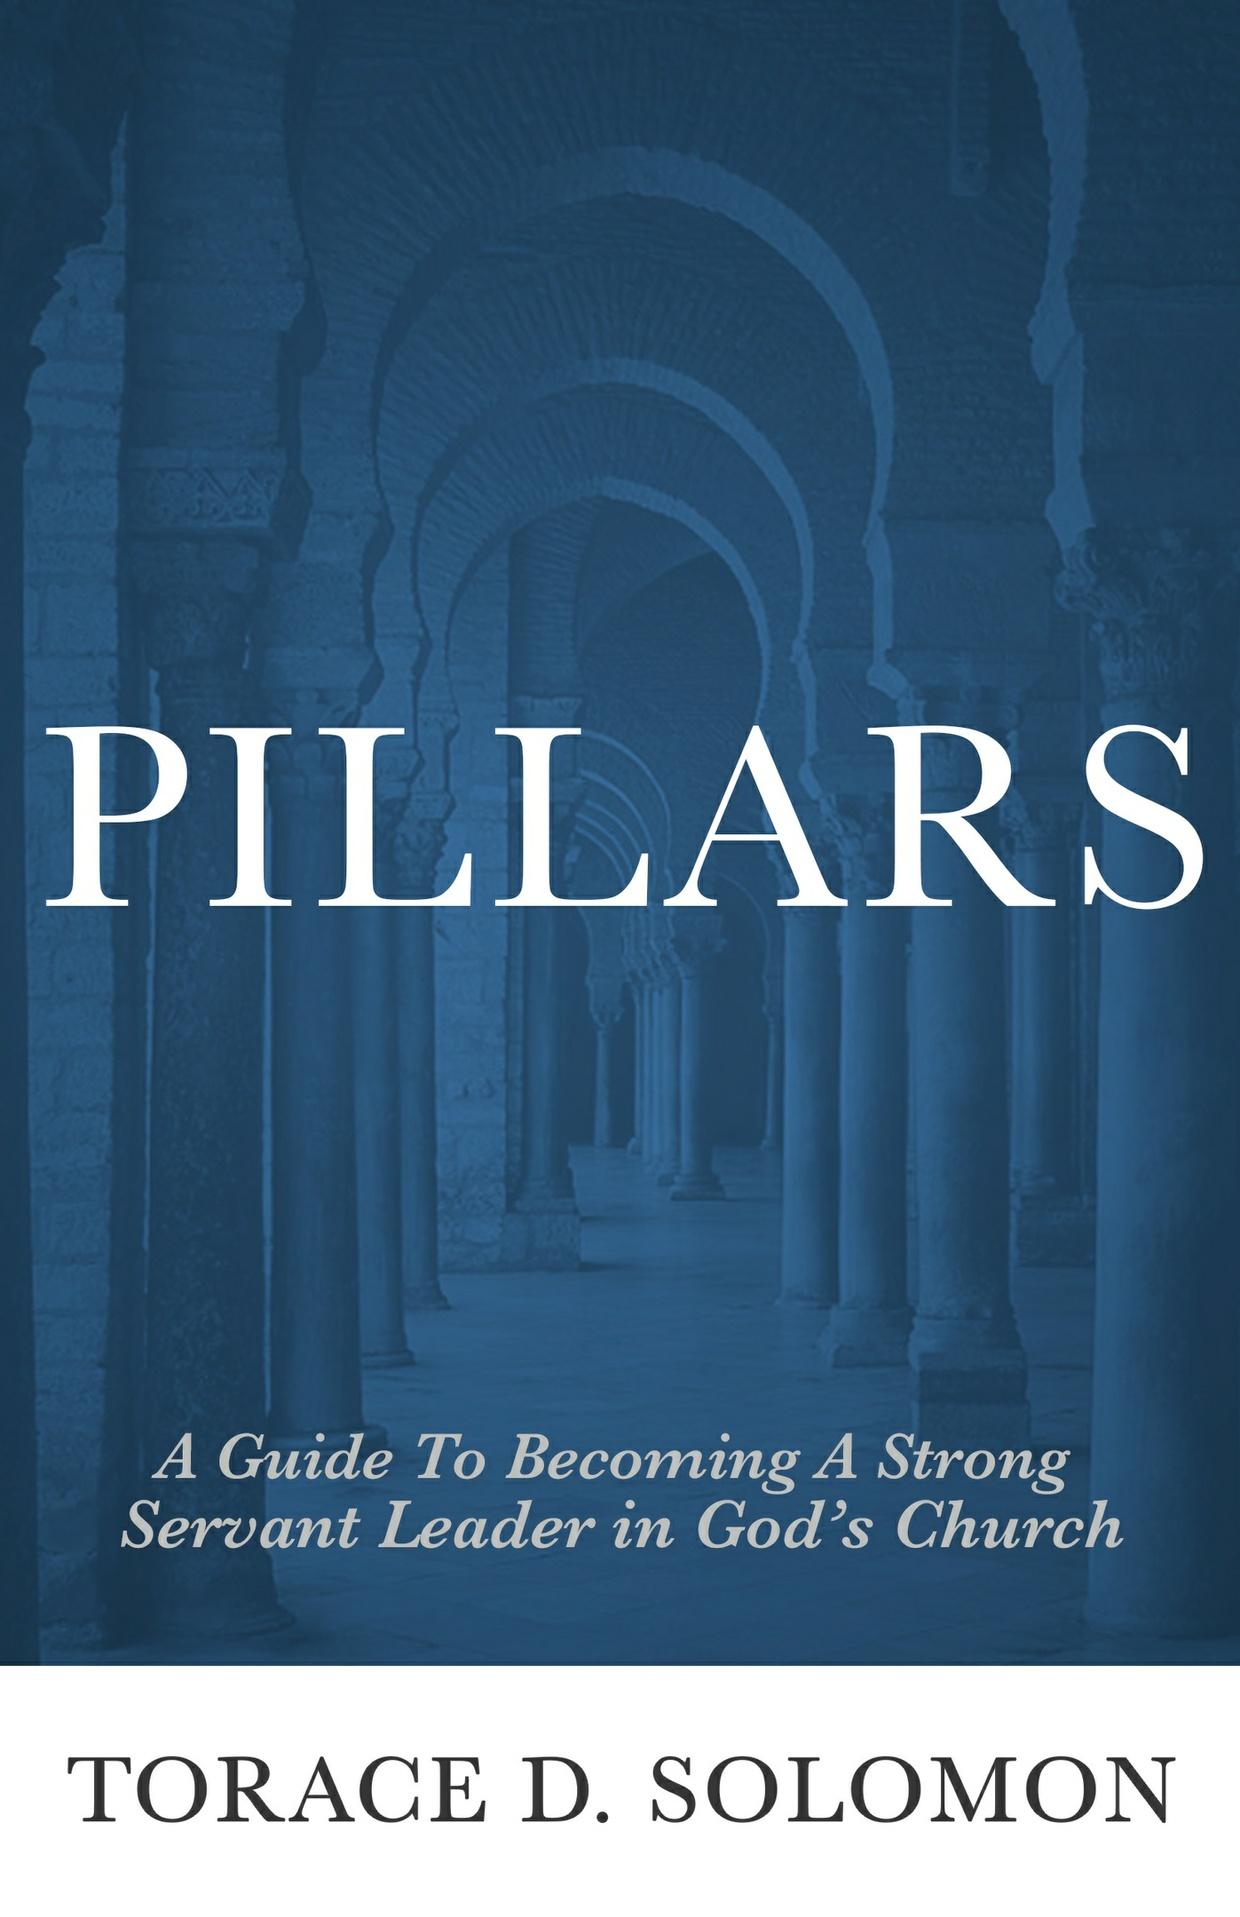 PILLARS Ebook